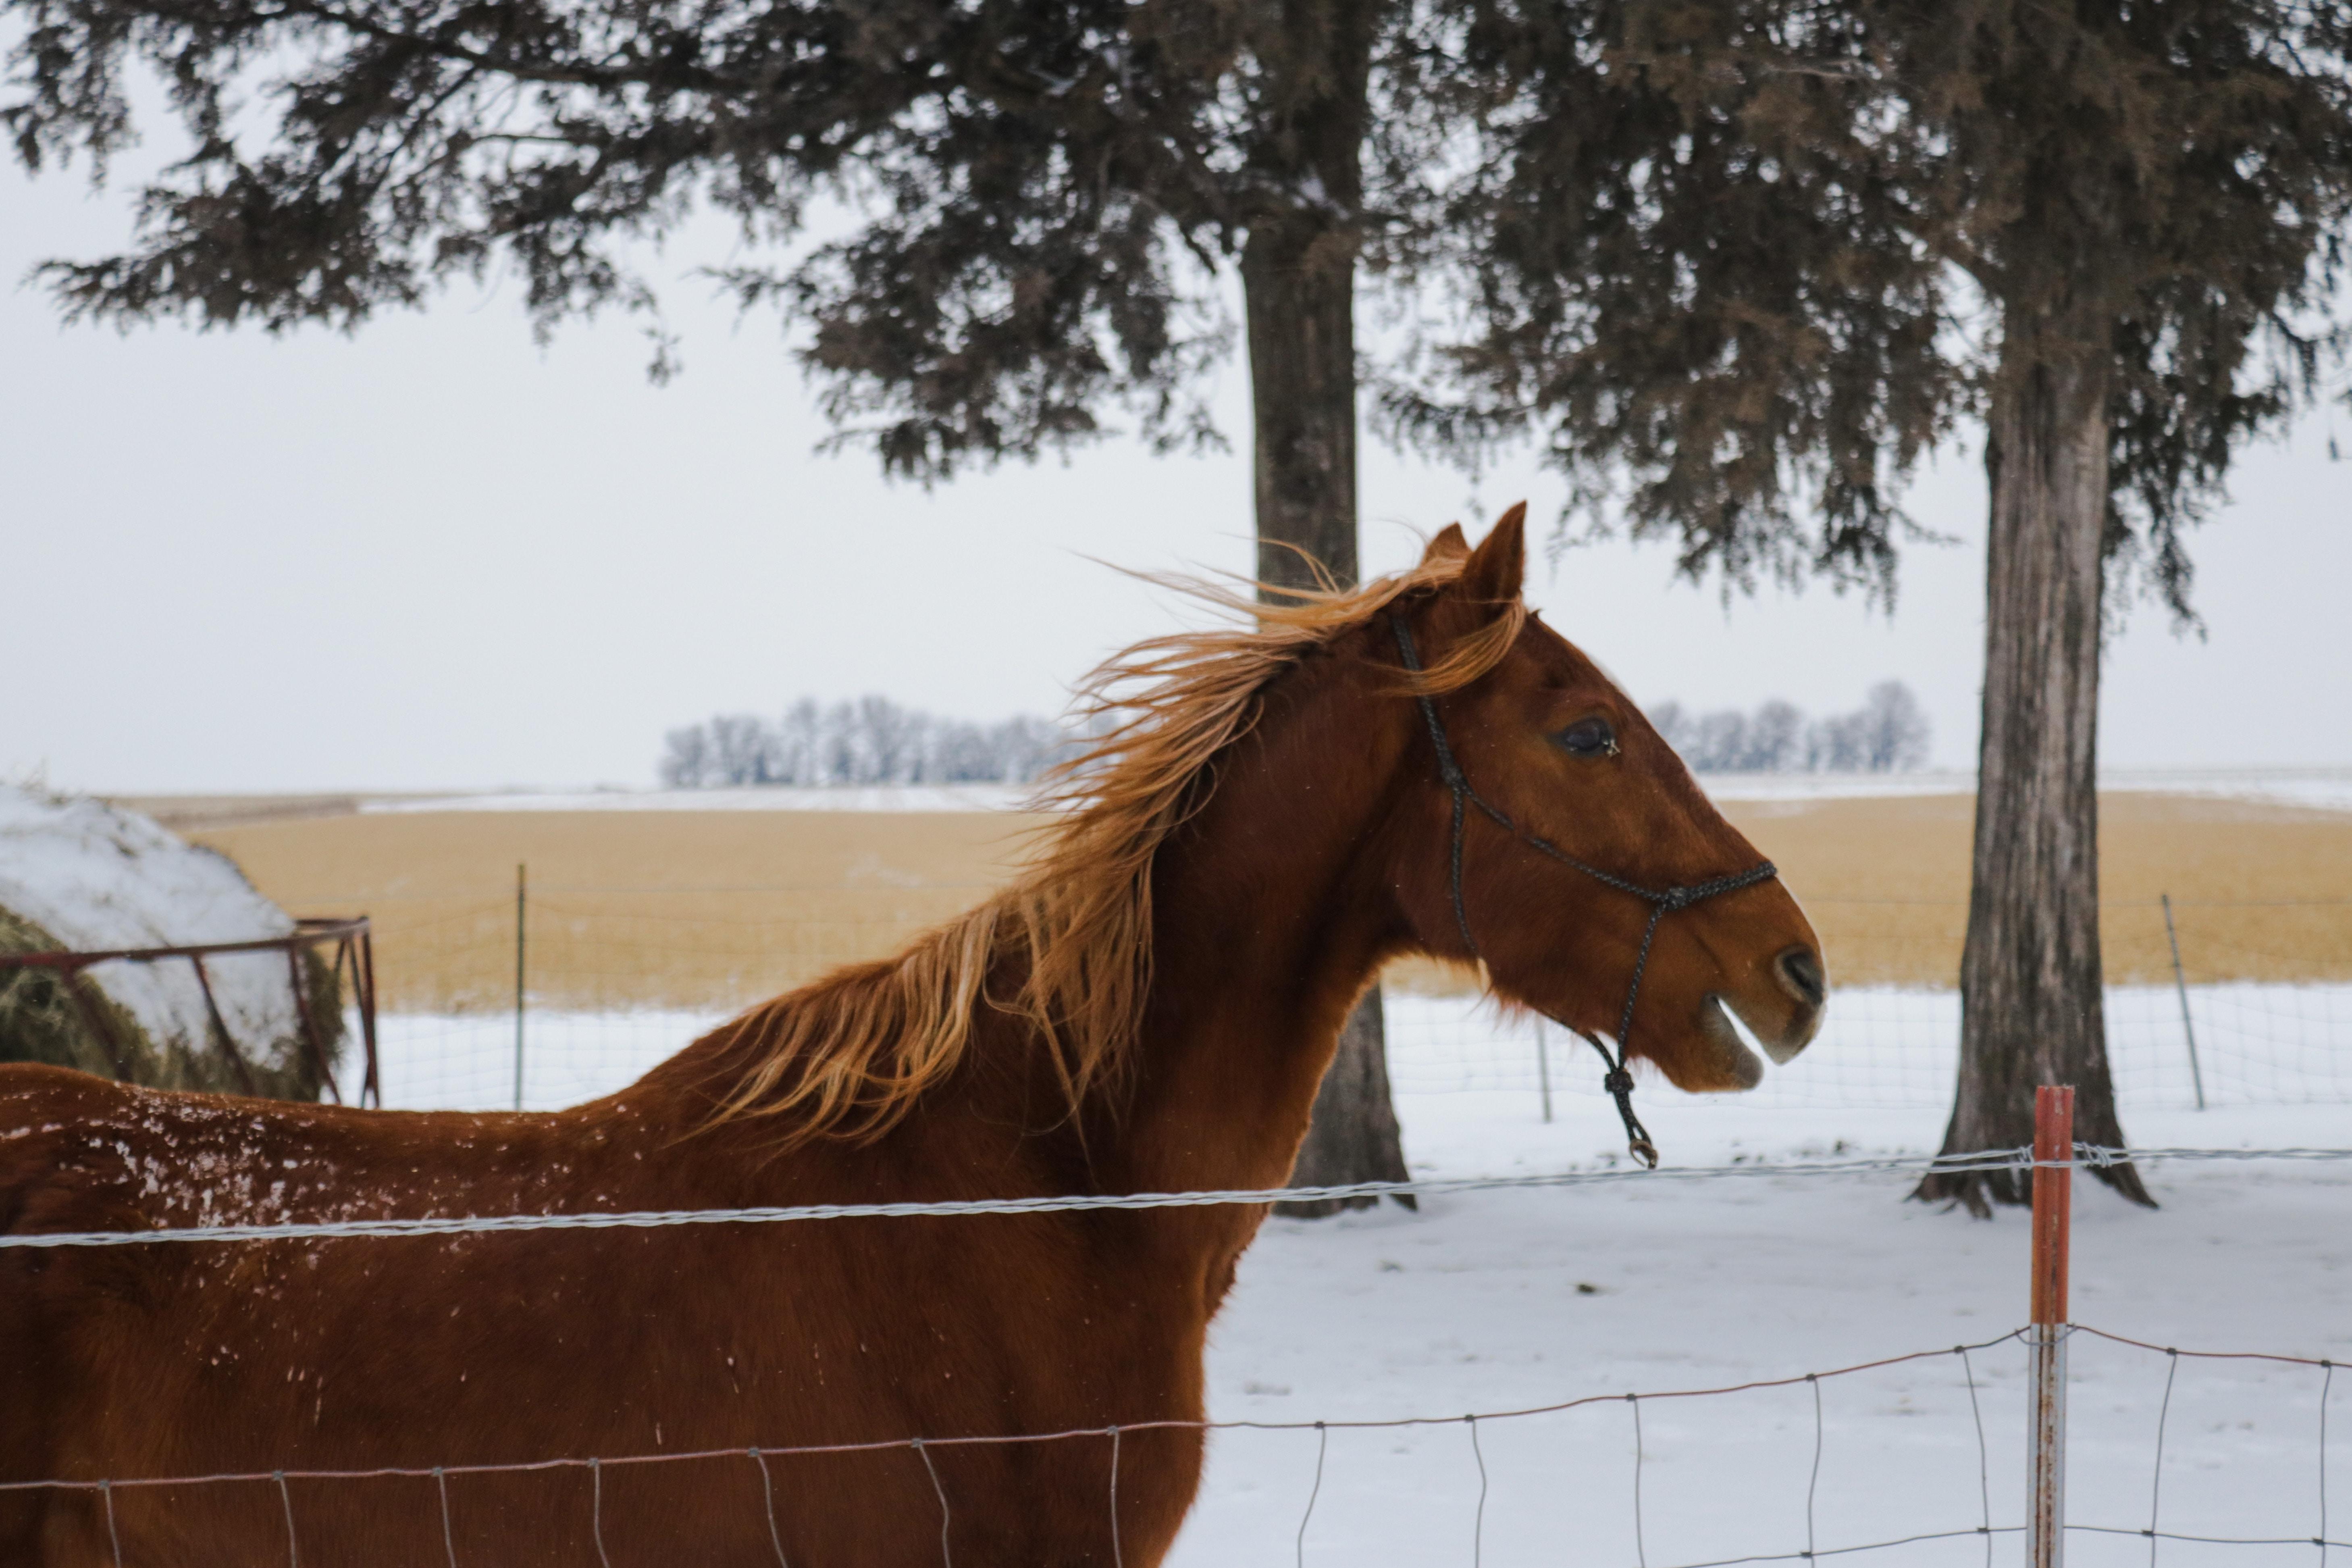 horse on snow field near trees